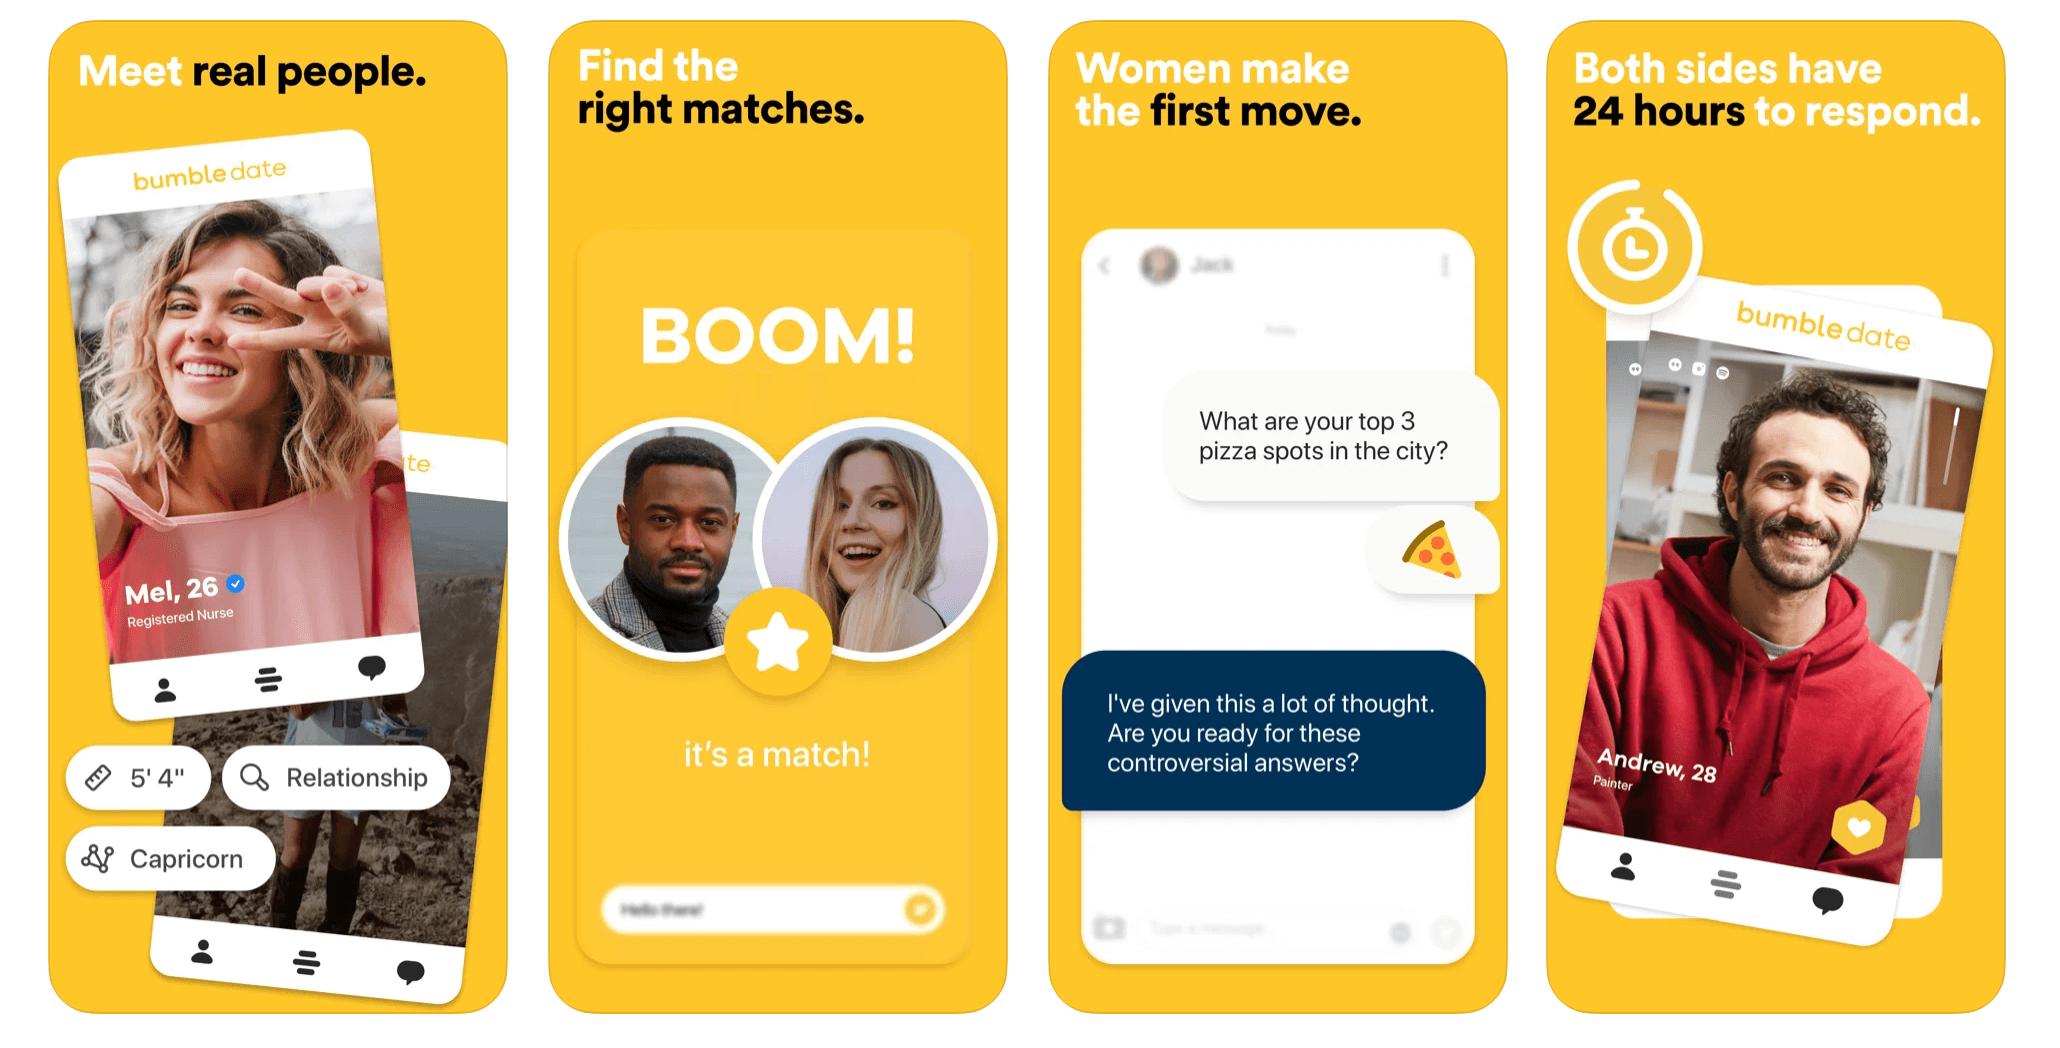 Bumblebff app screenshots